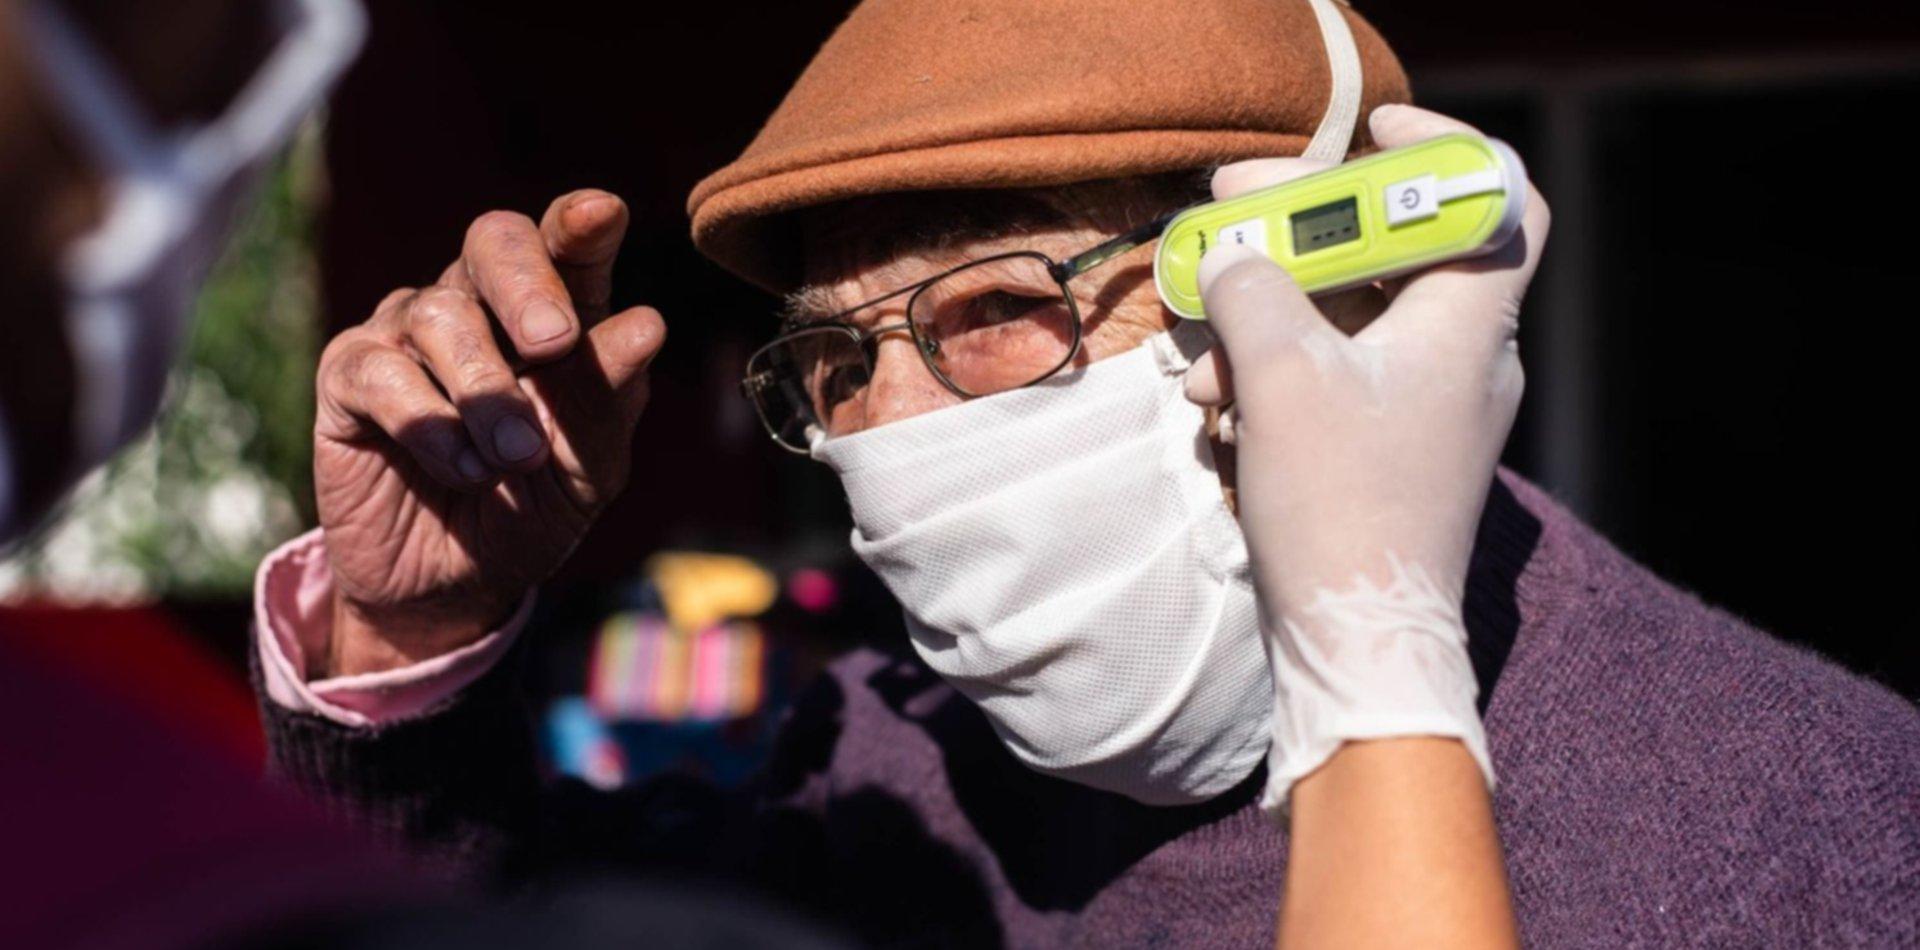 Detectaron cuatro casos nuevos de coronavirus en La Plata